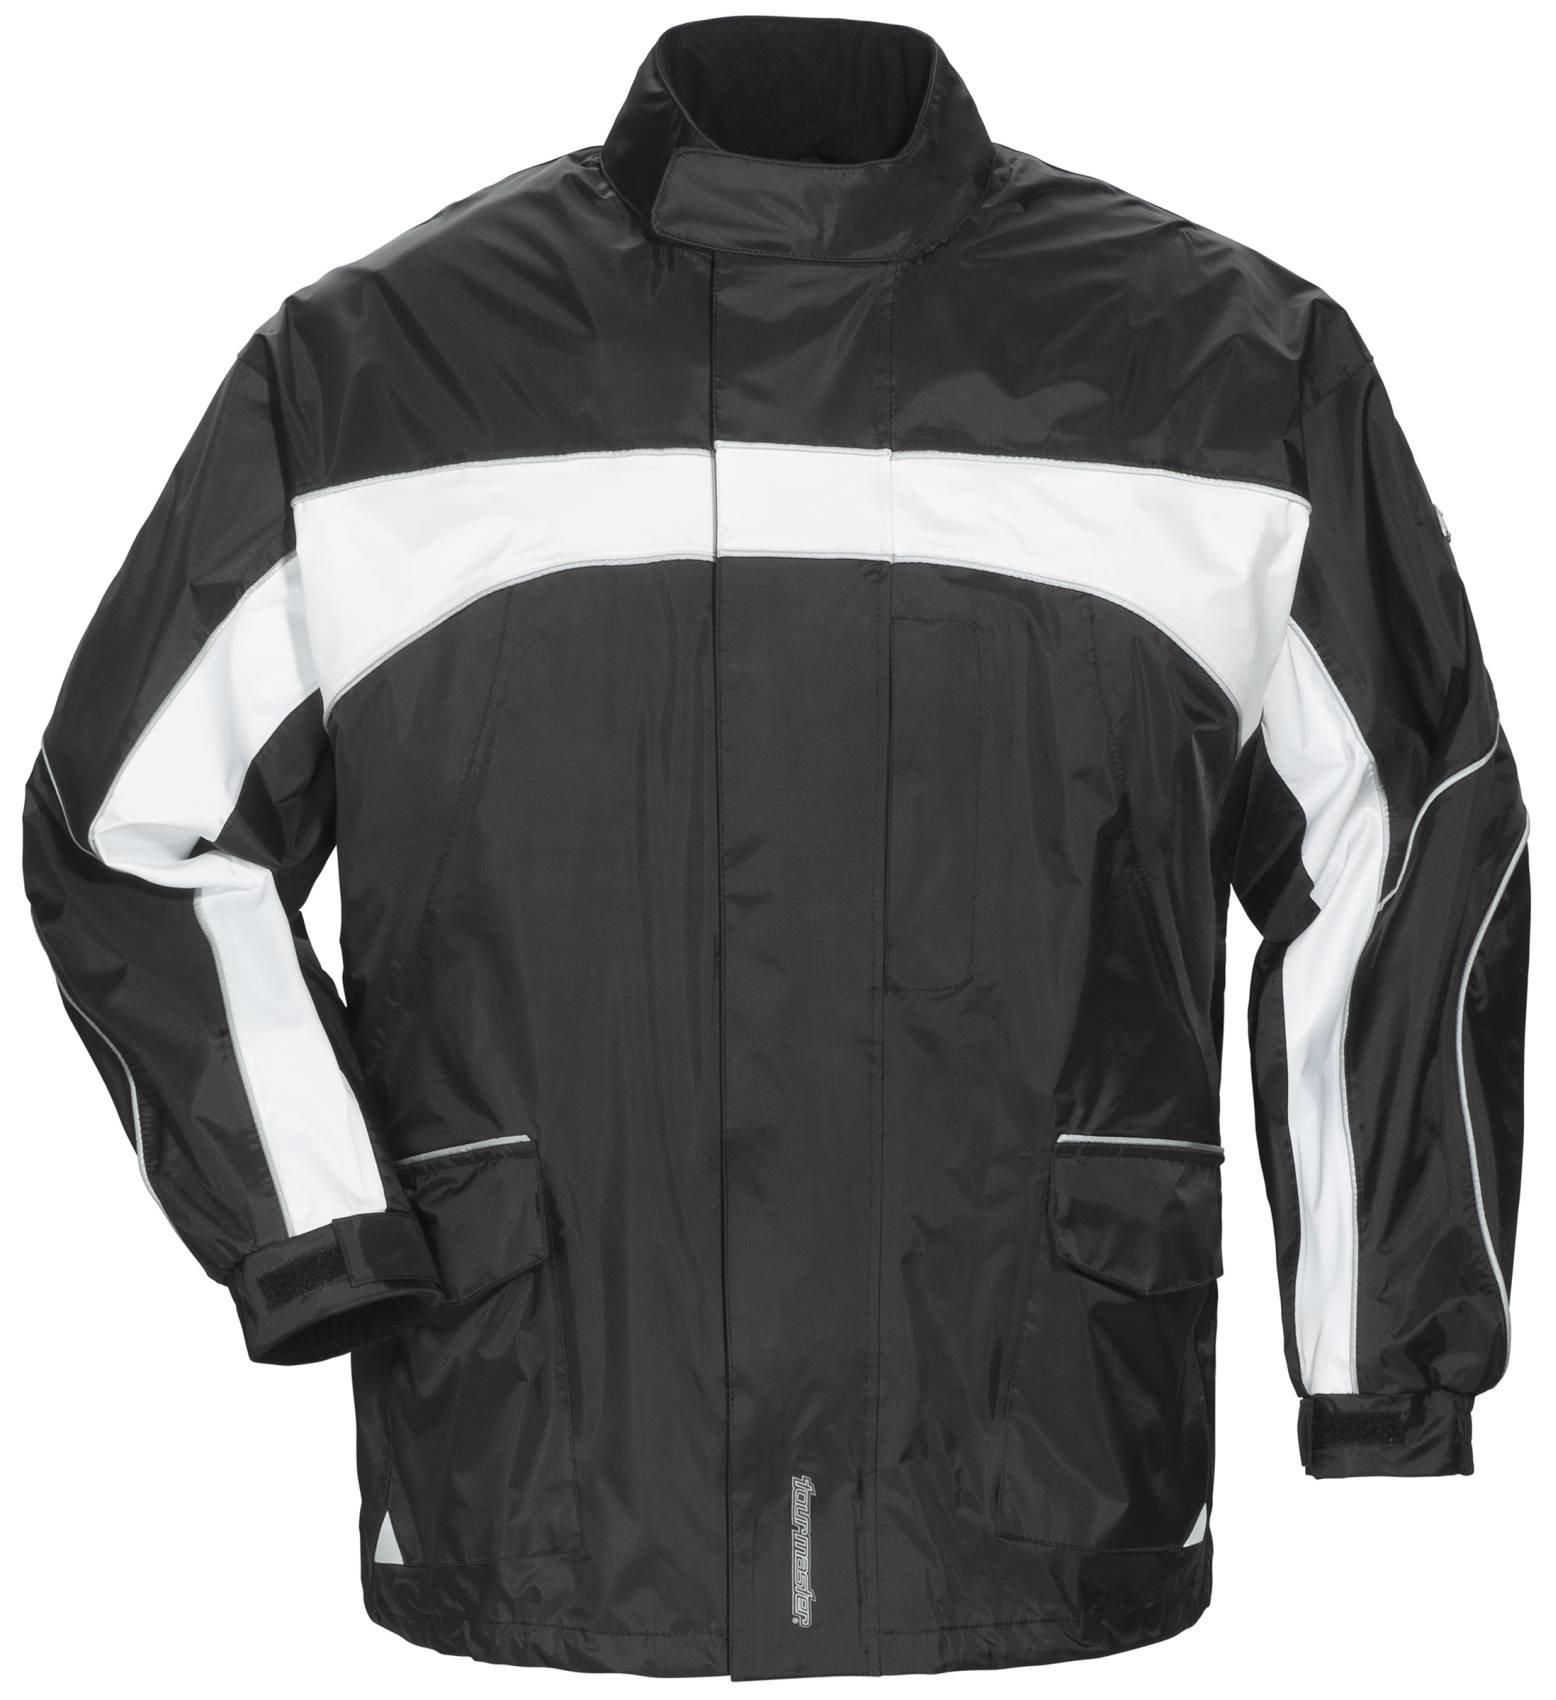 Tourmaster Elite 3 Rain Jacket (X-LARGE) (BLACK/BLACK/WHITE)